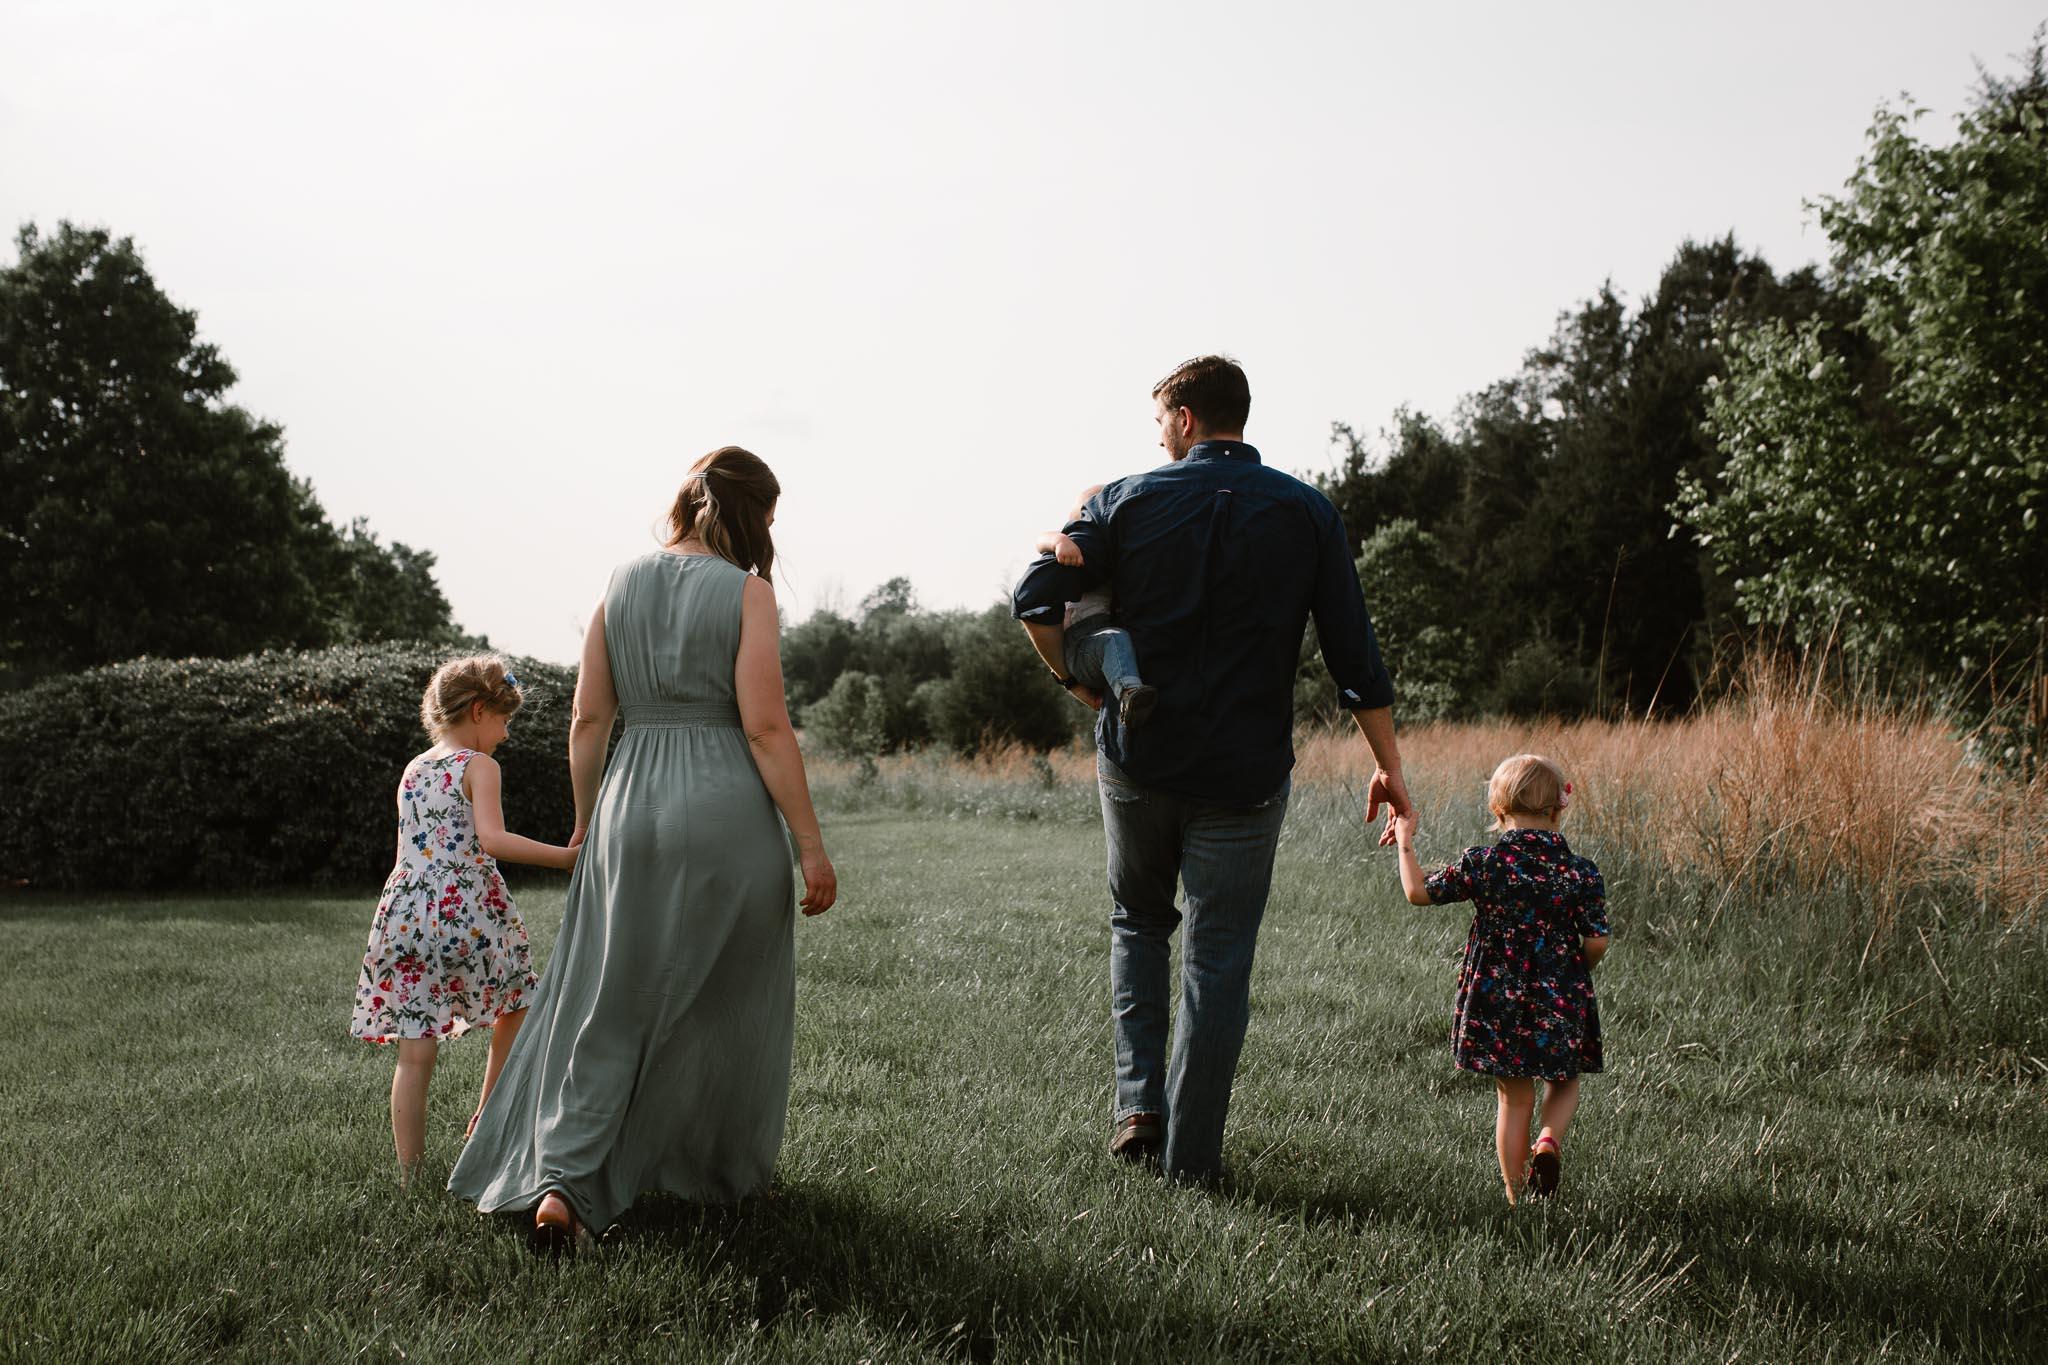 Family holding hands and walking through a field at Beaverdam Run in Ashburn, Virginia